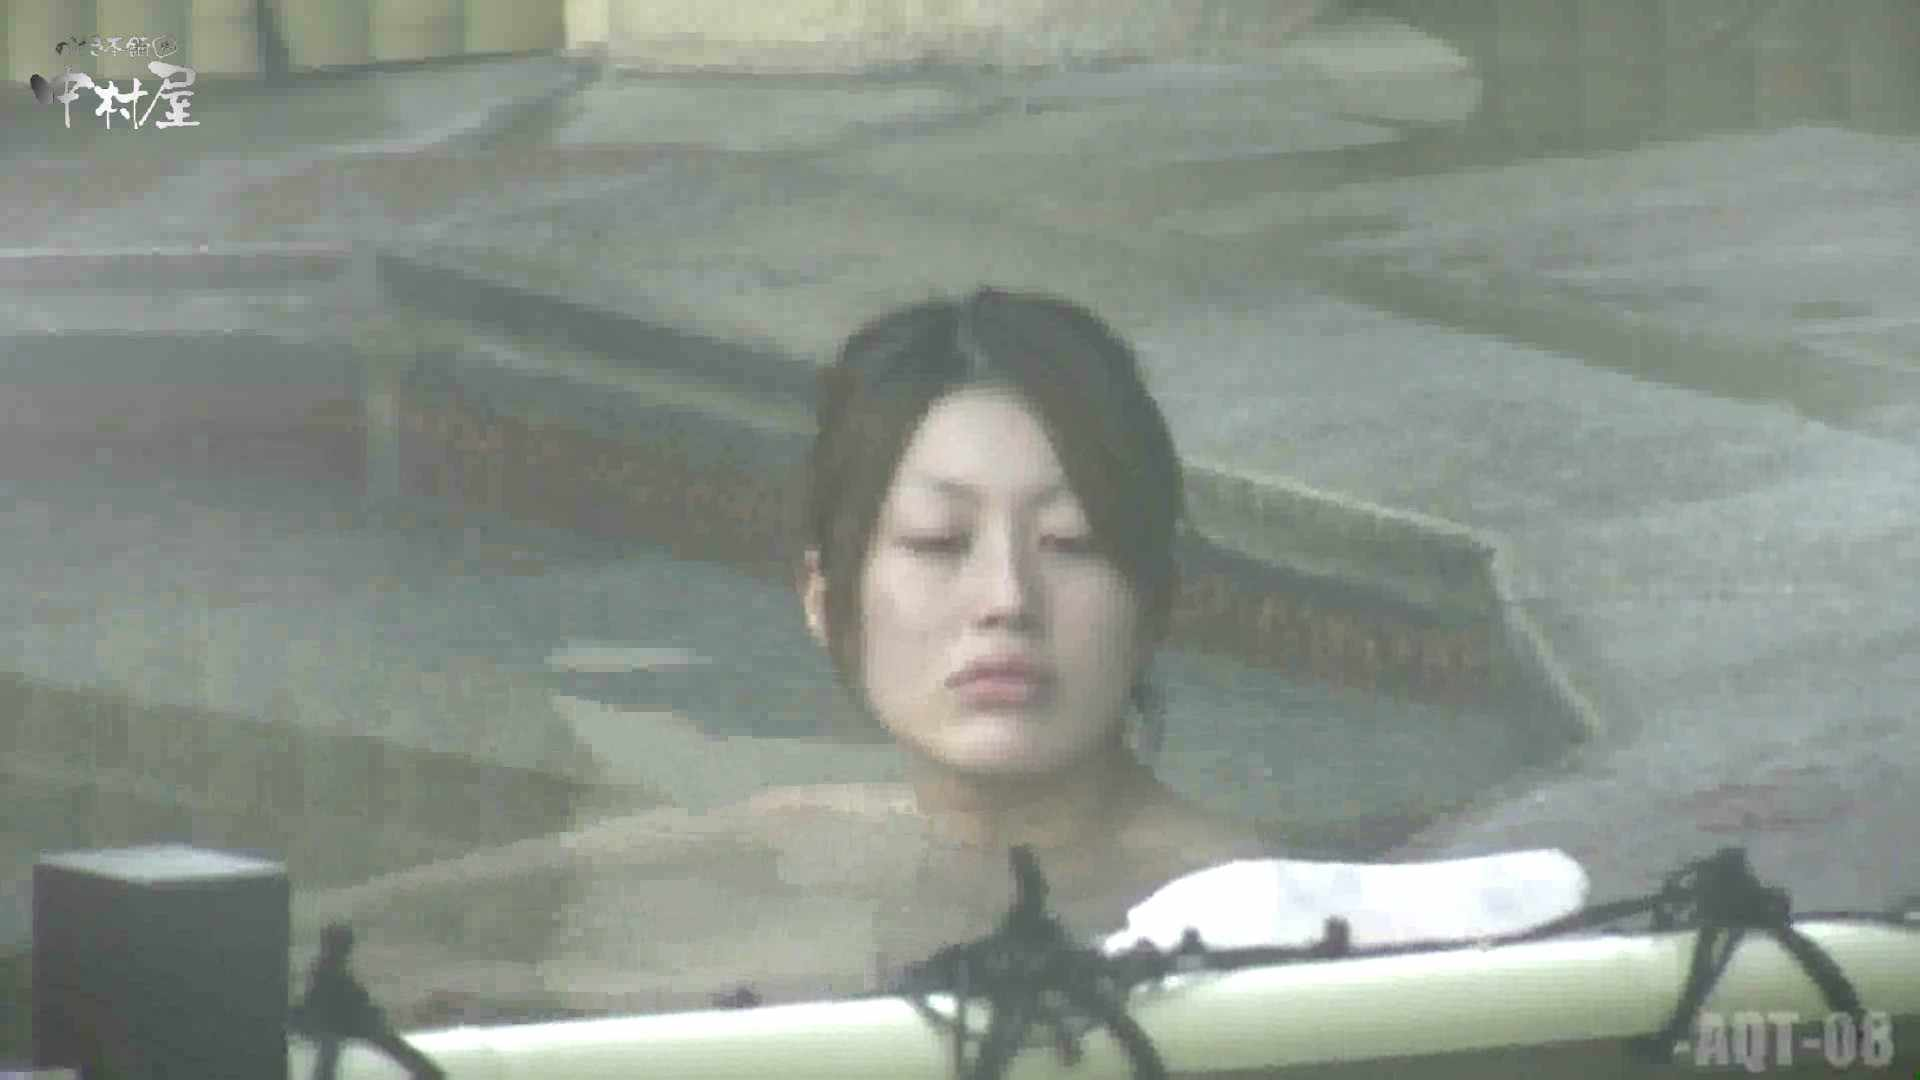 Aquaな露天風呂Vol.872潜入盗撮露天風呂八判湯 其の三 盗撮特集 | 潜入画像  96画像 70